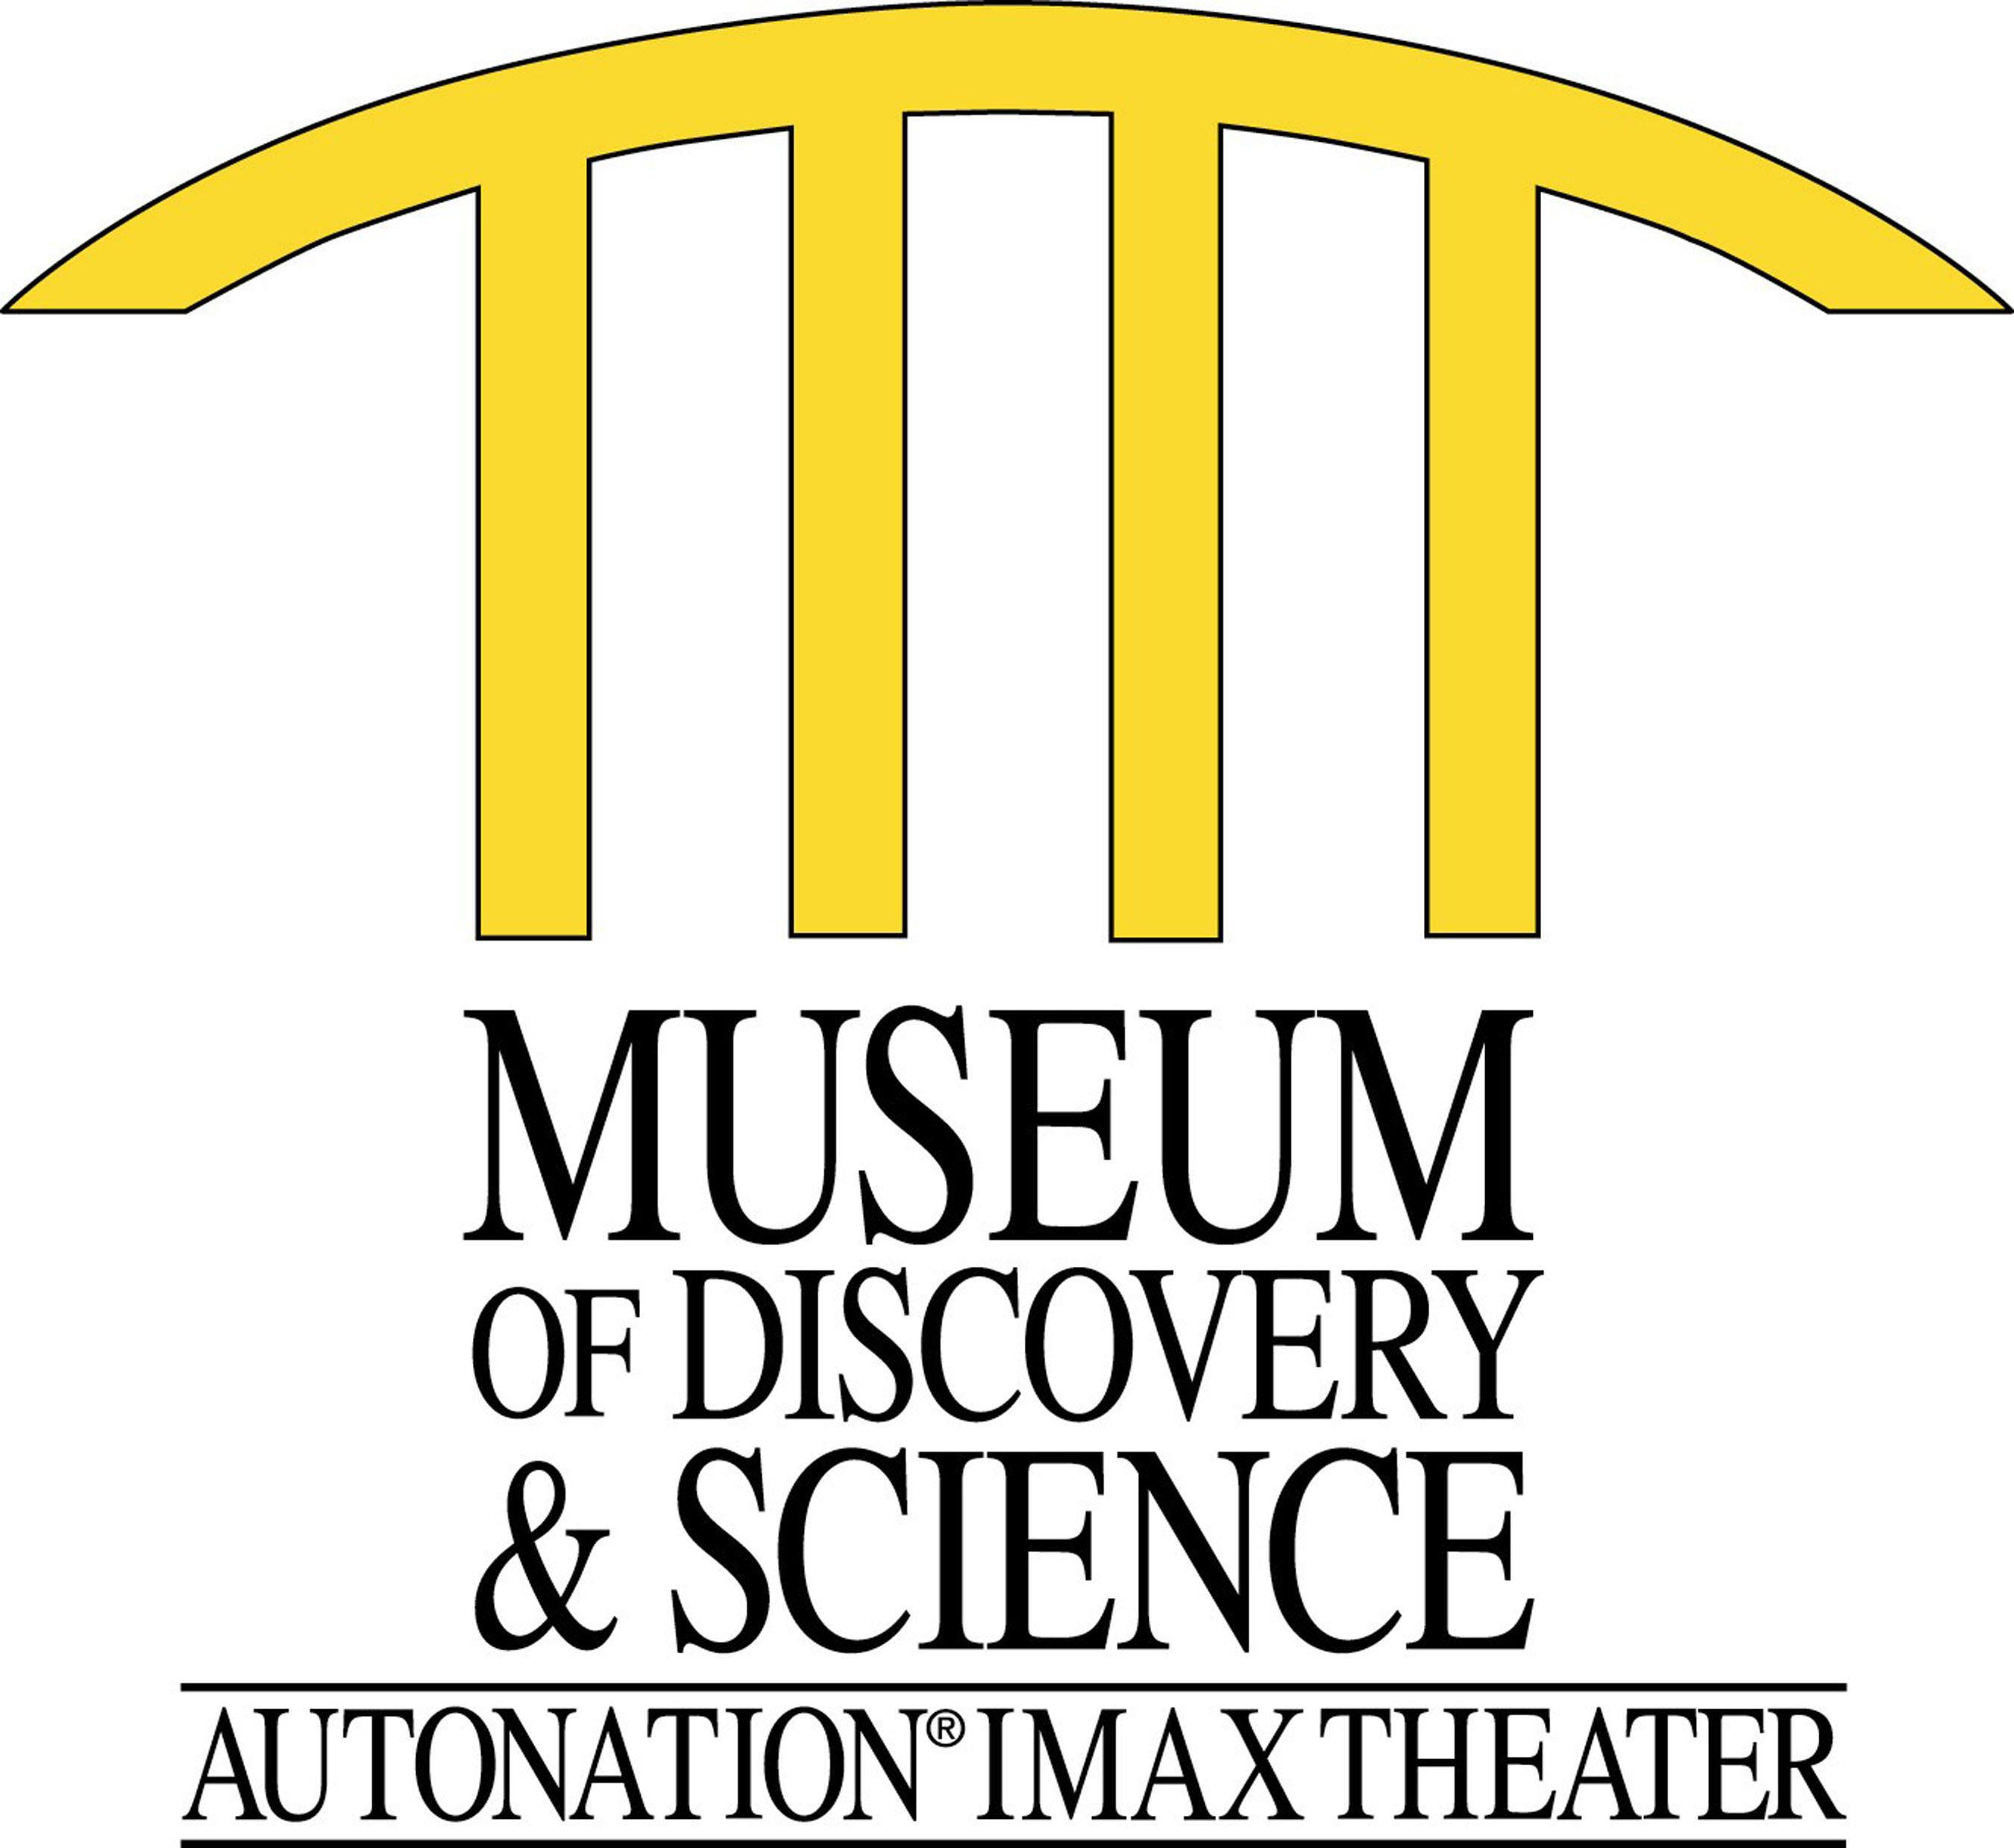 museum of discovery science logo the hotspotorlando. Black Bedroom Furniture Sets. Home Design Ideas